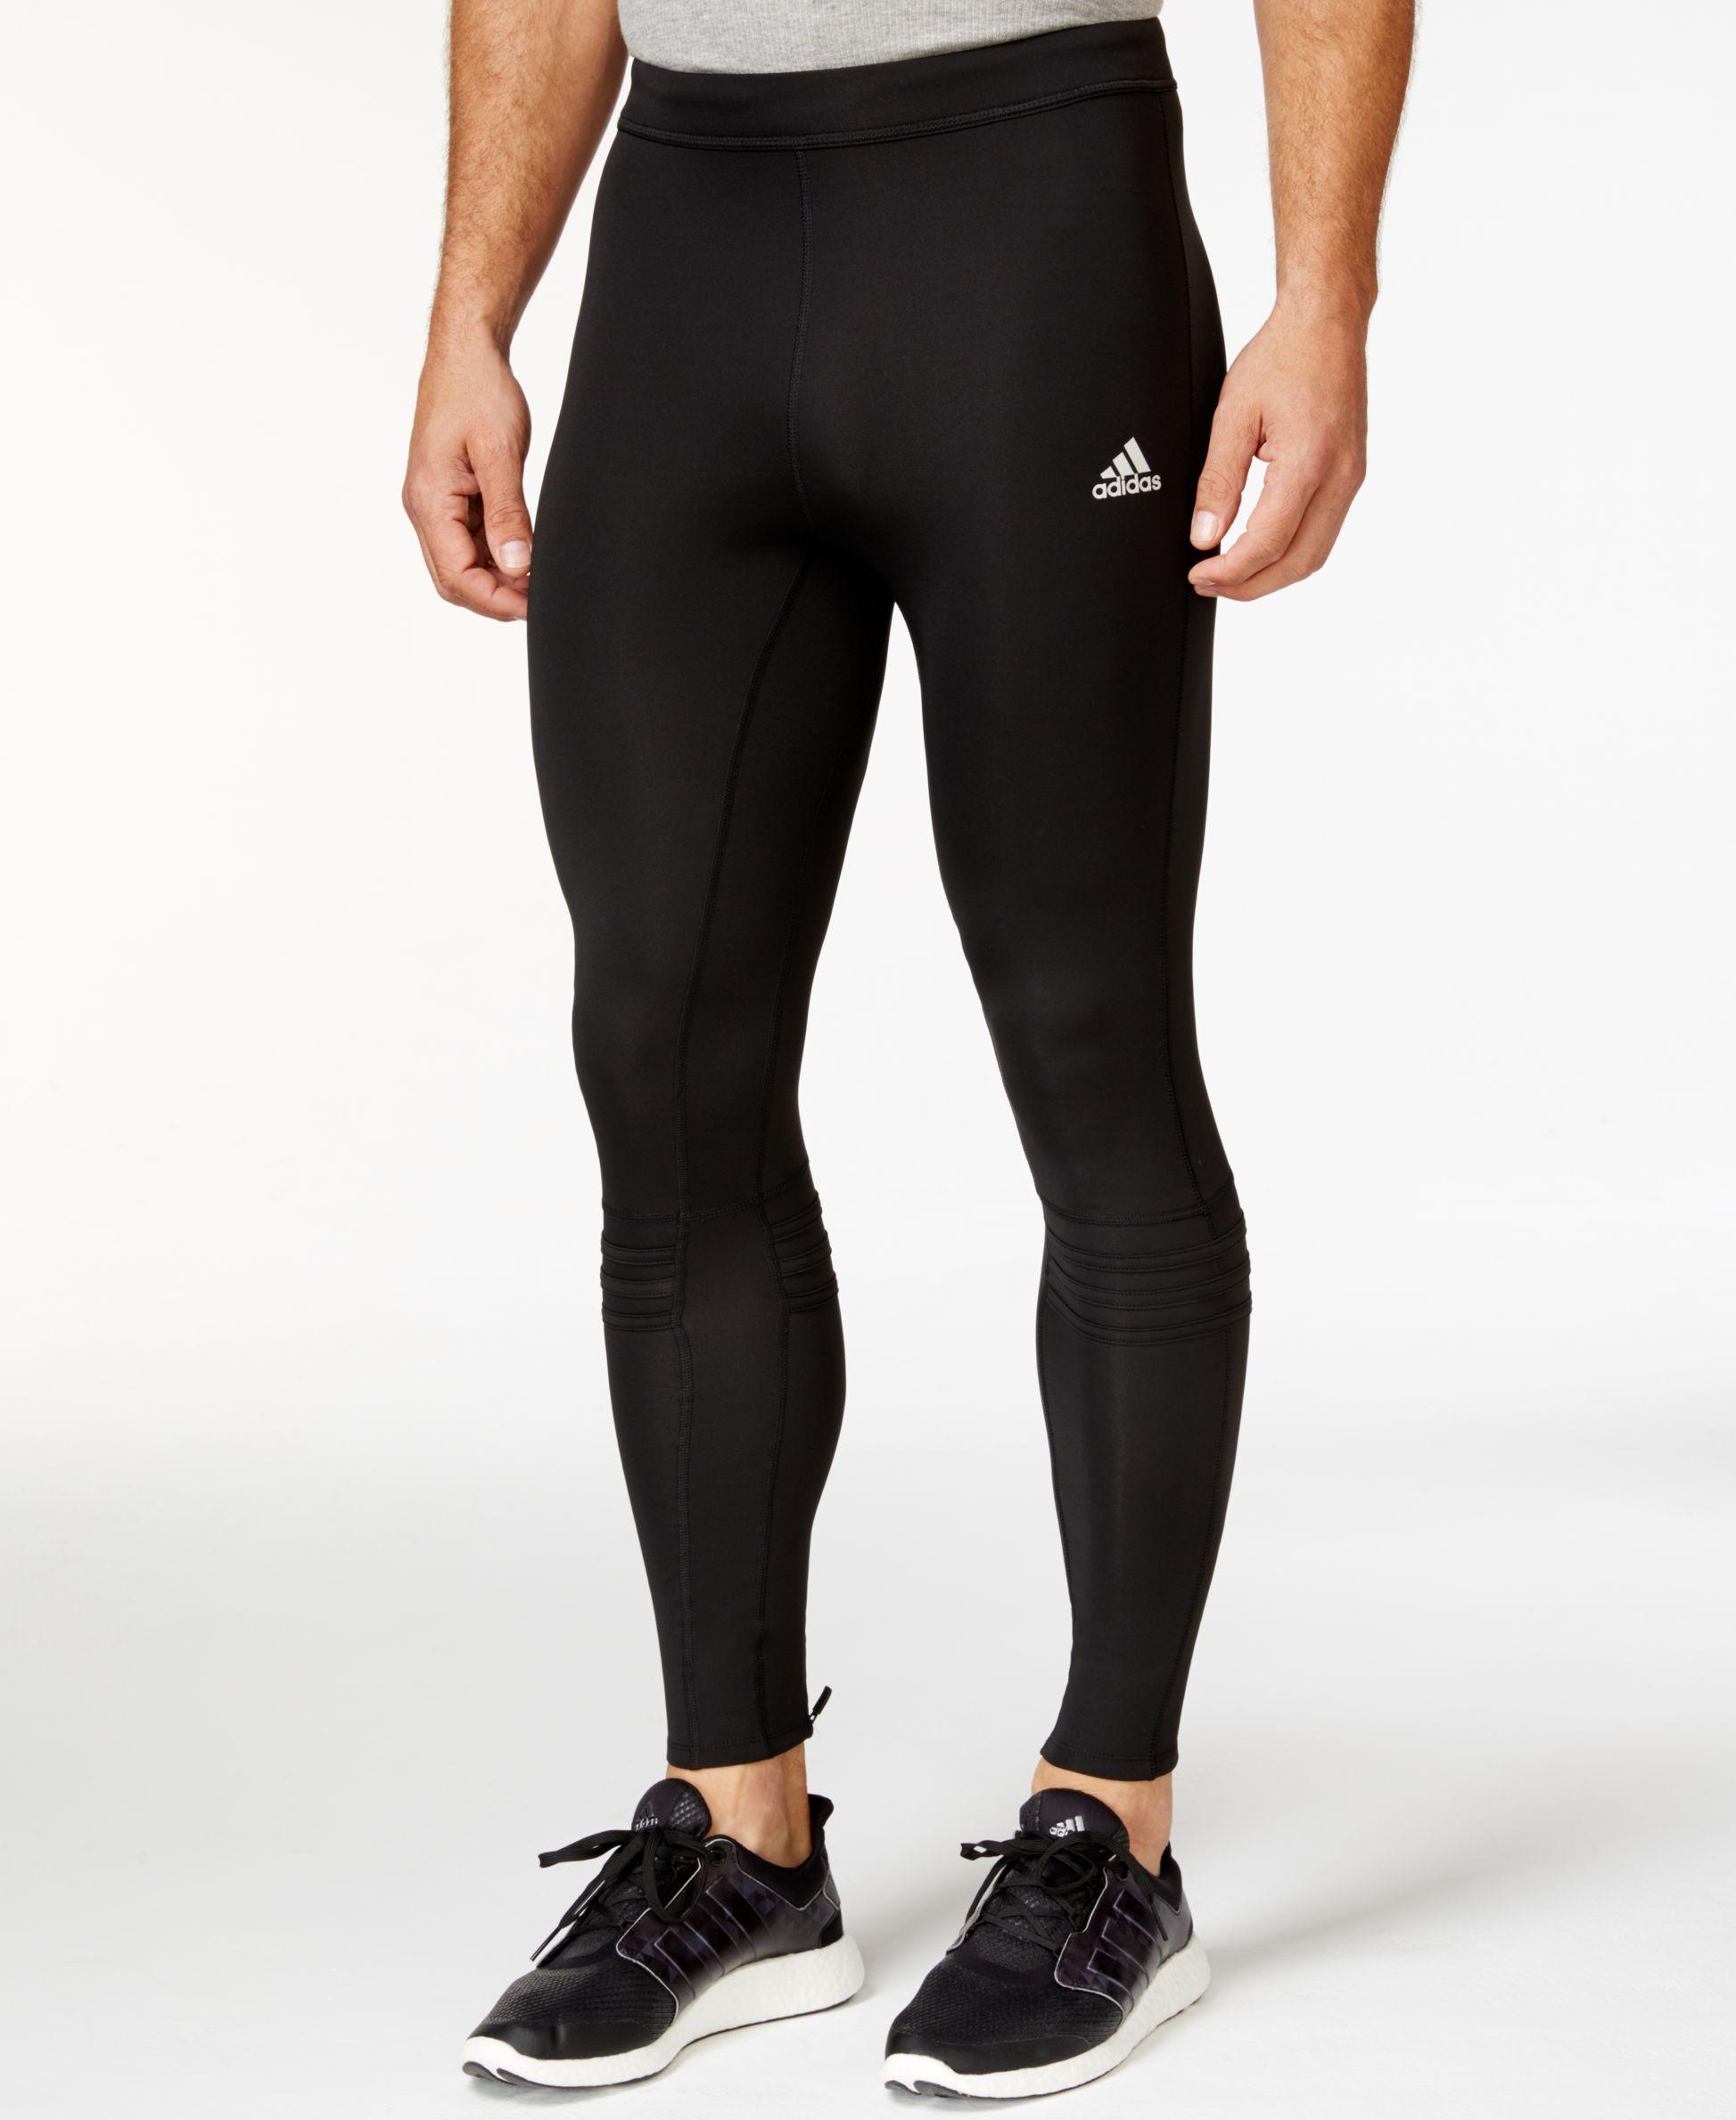 adidas Mens Supernova Tights Bottoms Pants Trousers Black Sports Running